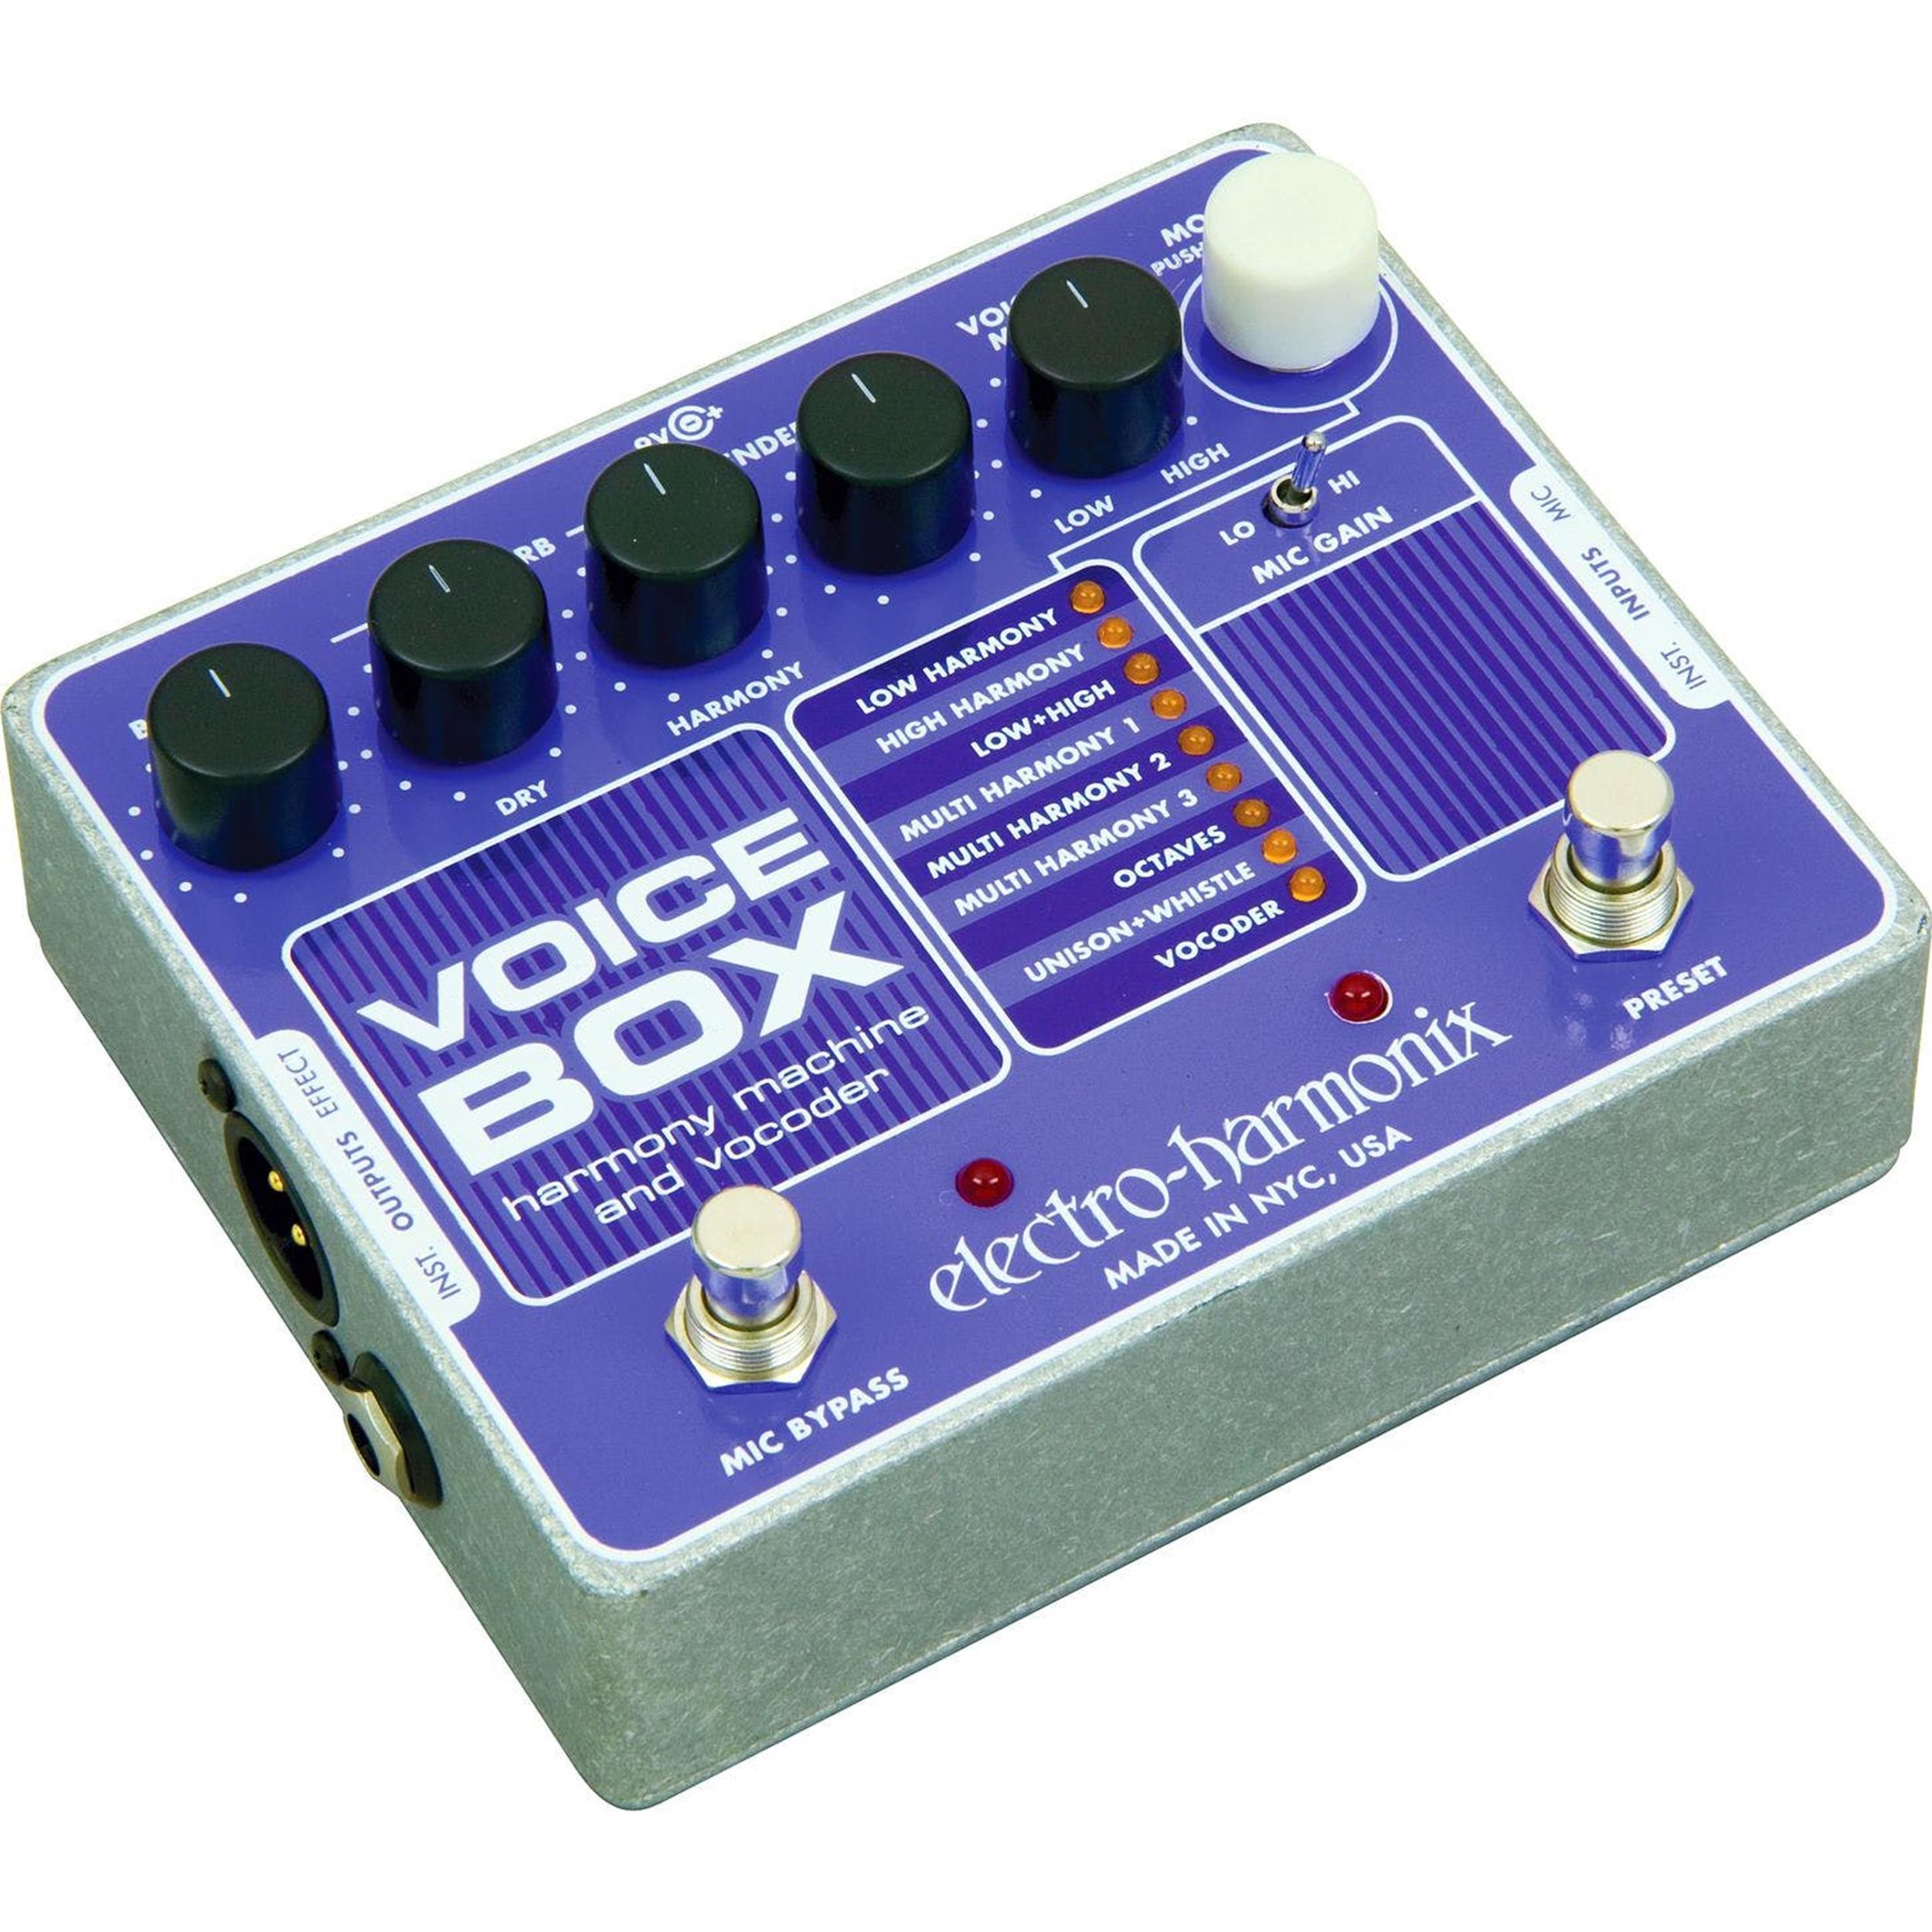 ELECTRO-HARMONIX-VOICE-BOX-sku-2355